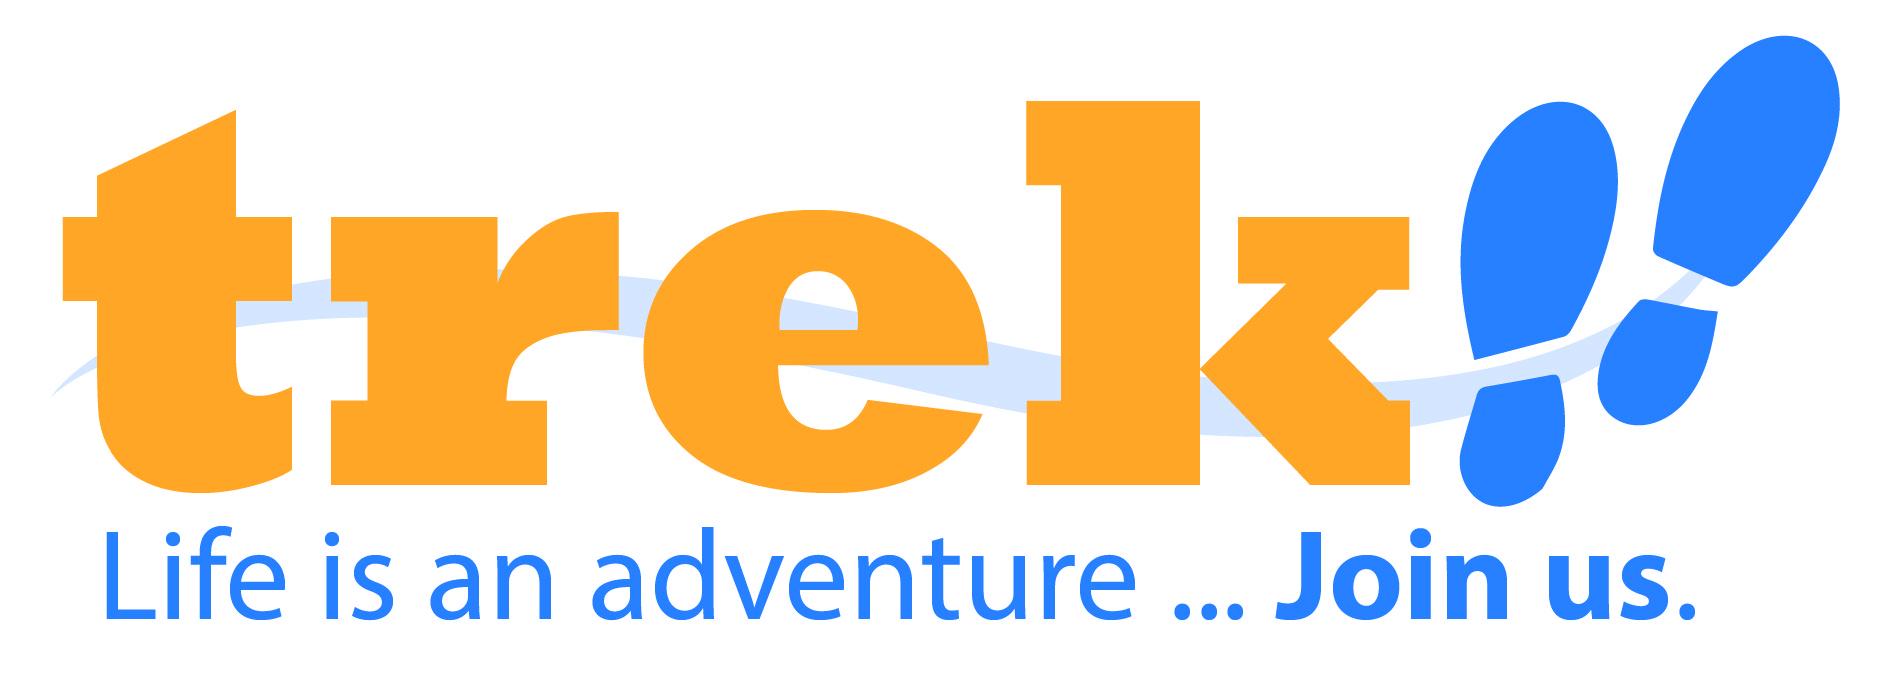 Trek logo highres